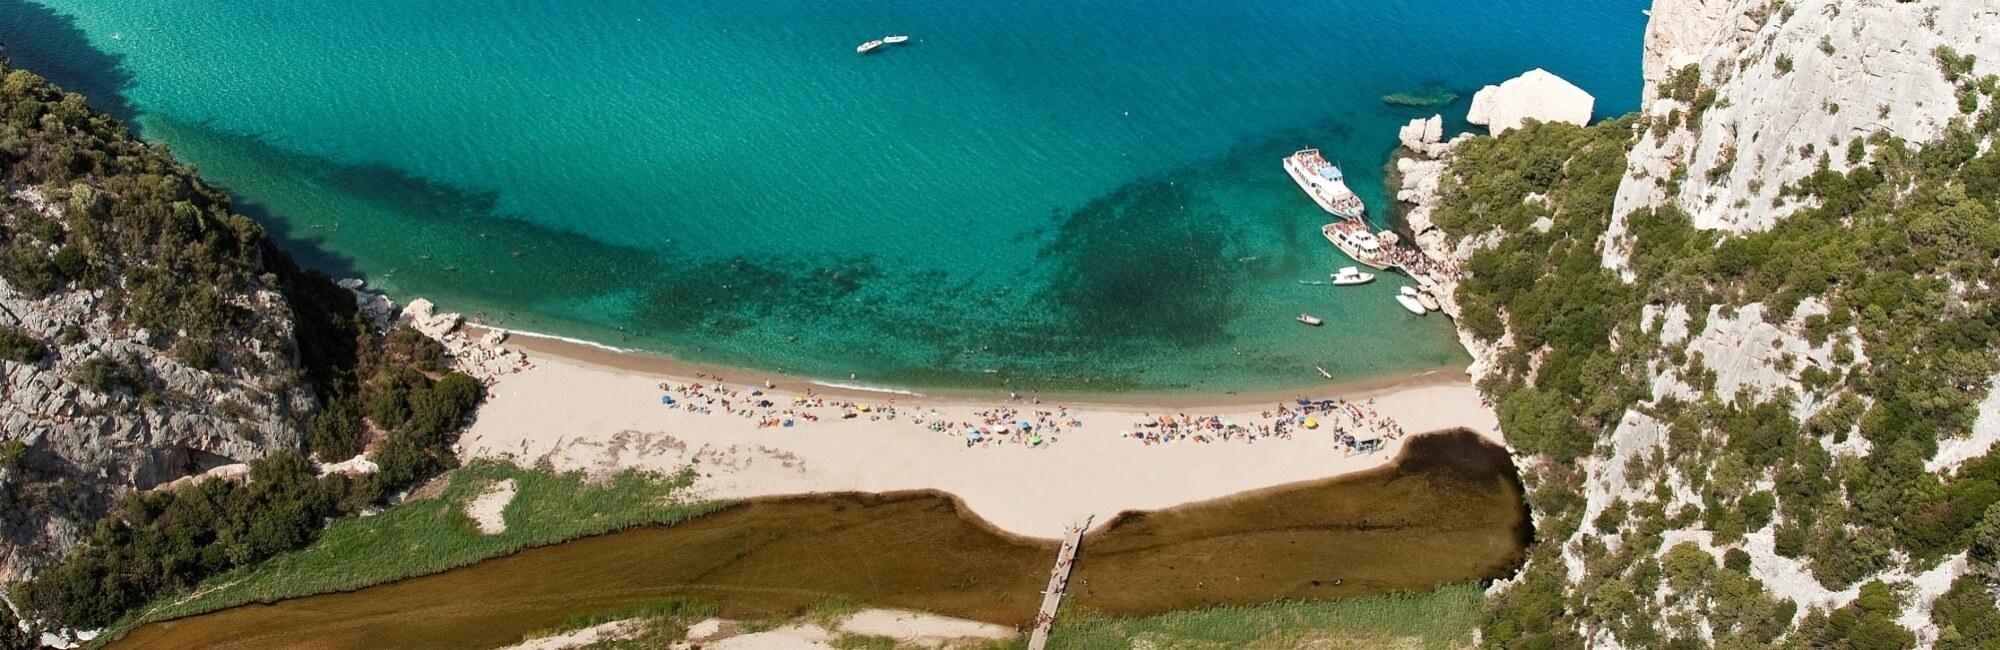 Golfo di Orosei, inimitabile bellezza!